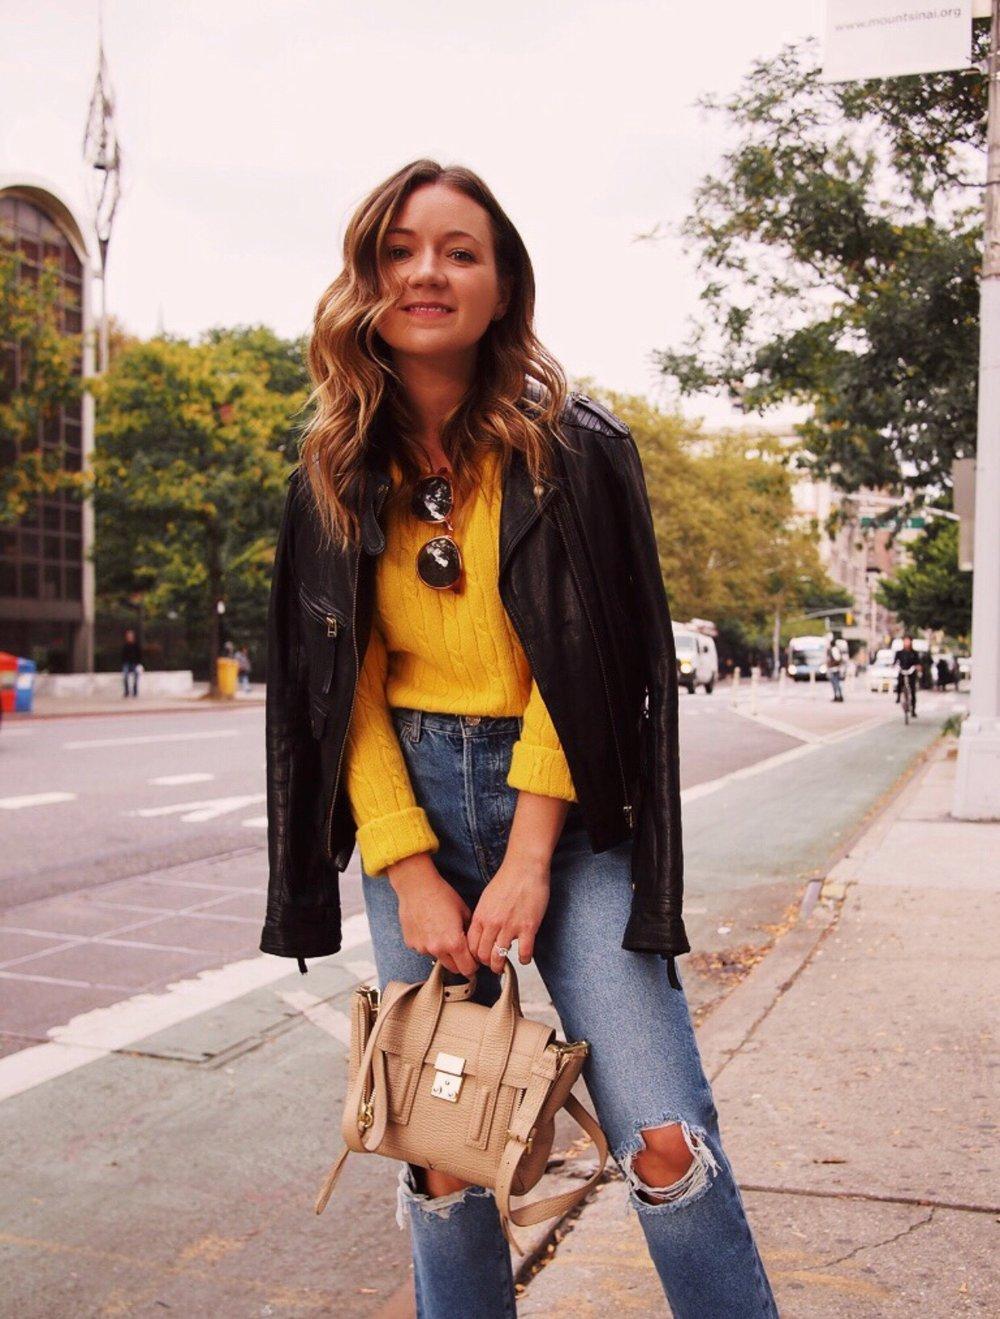 Fizz-fade-yellow-sweater.JPG